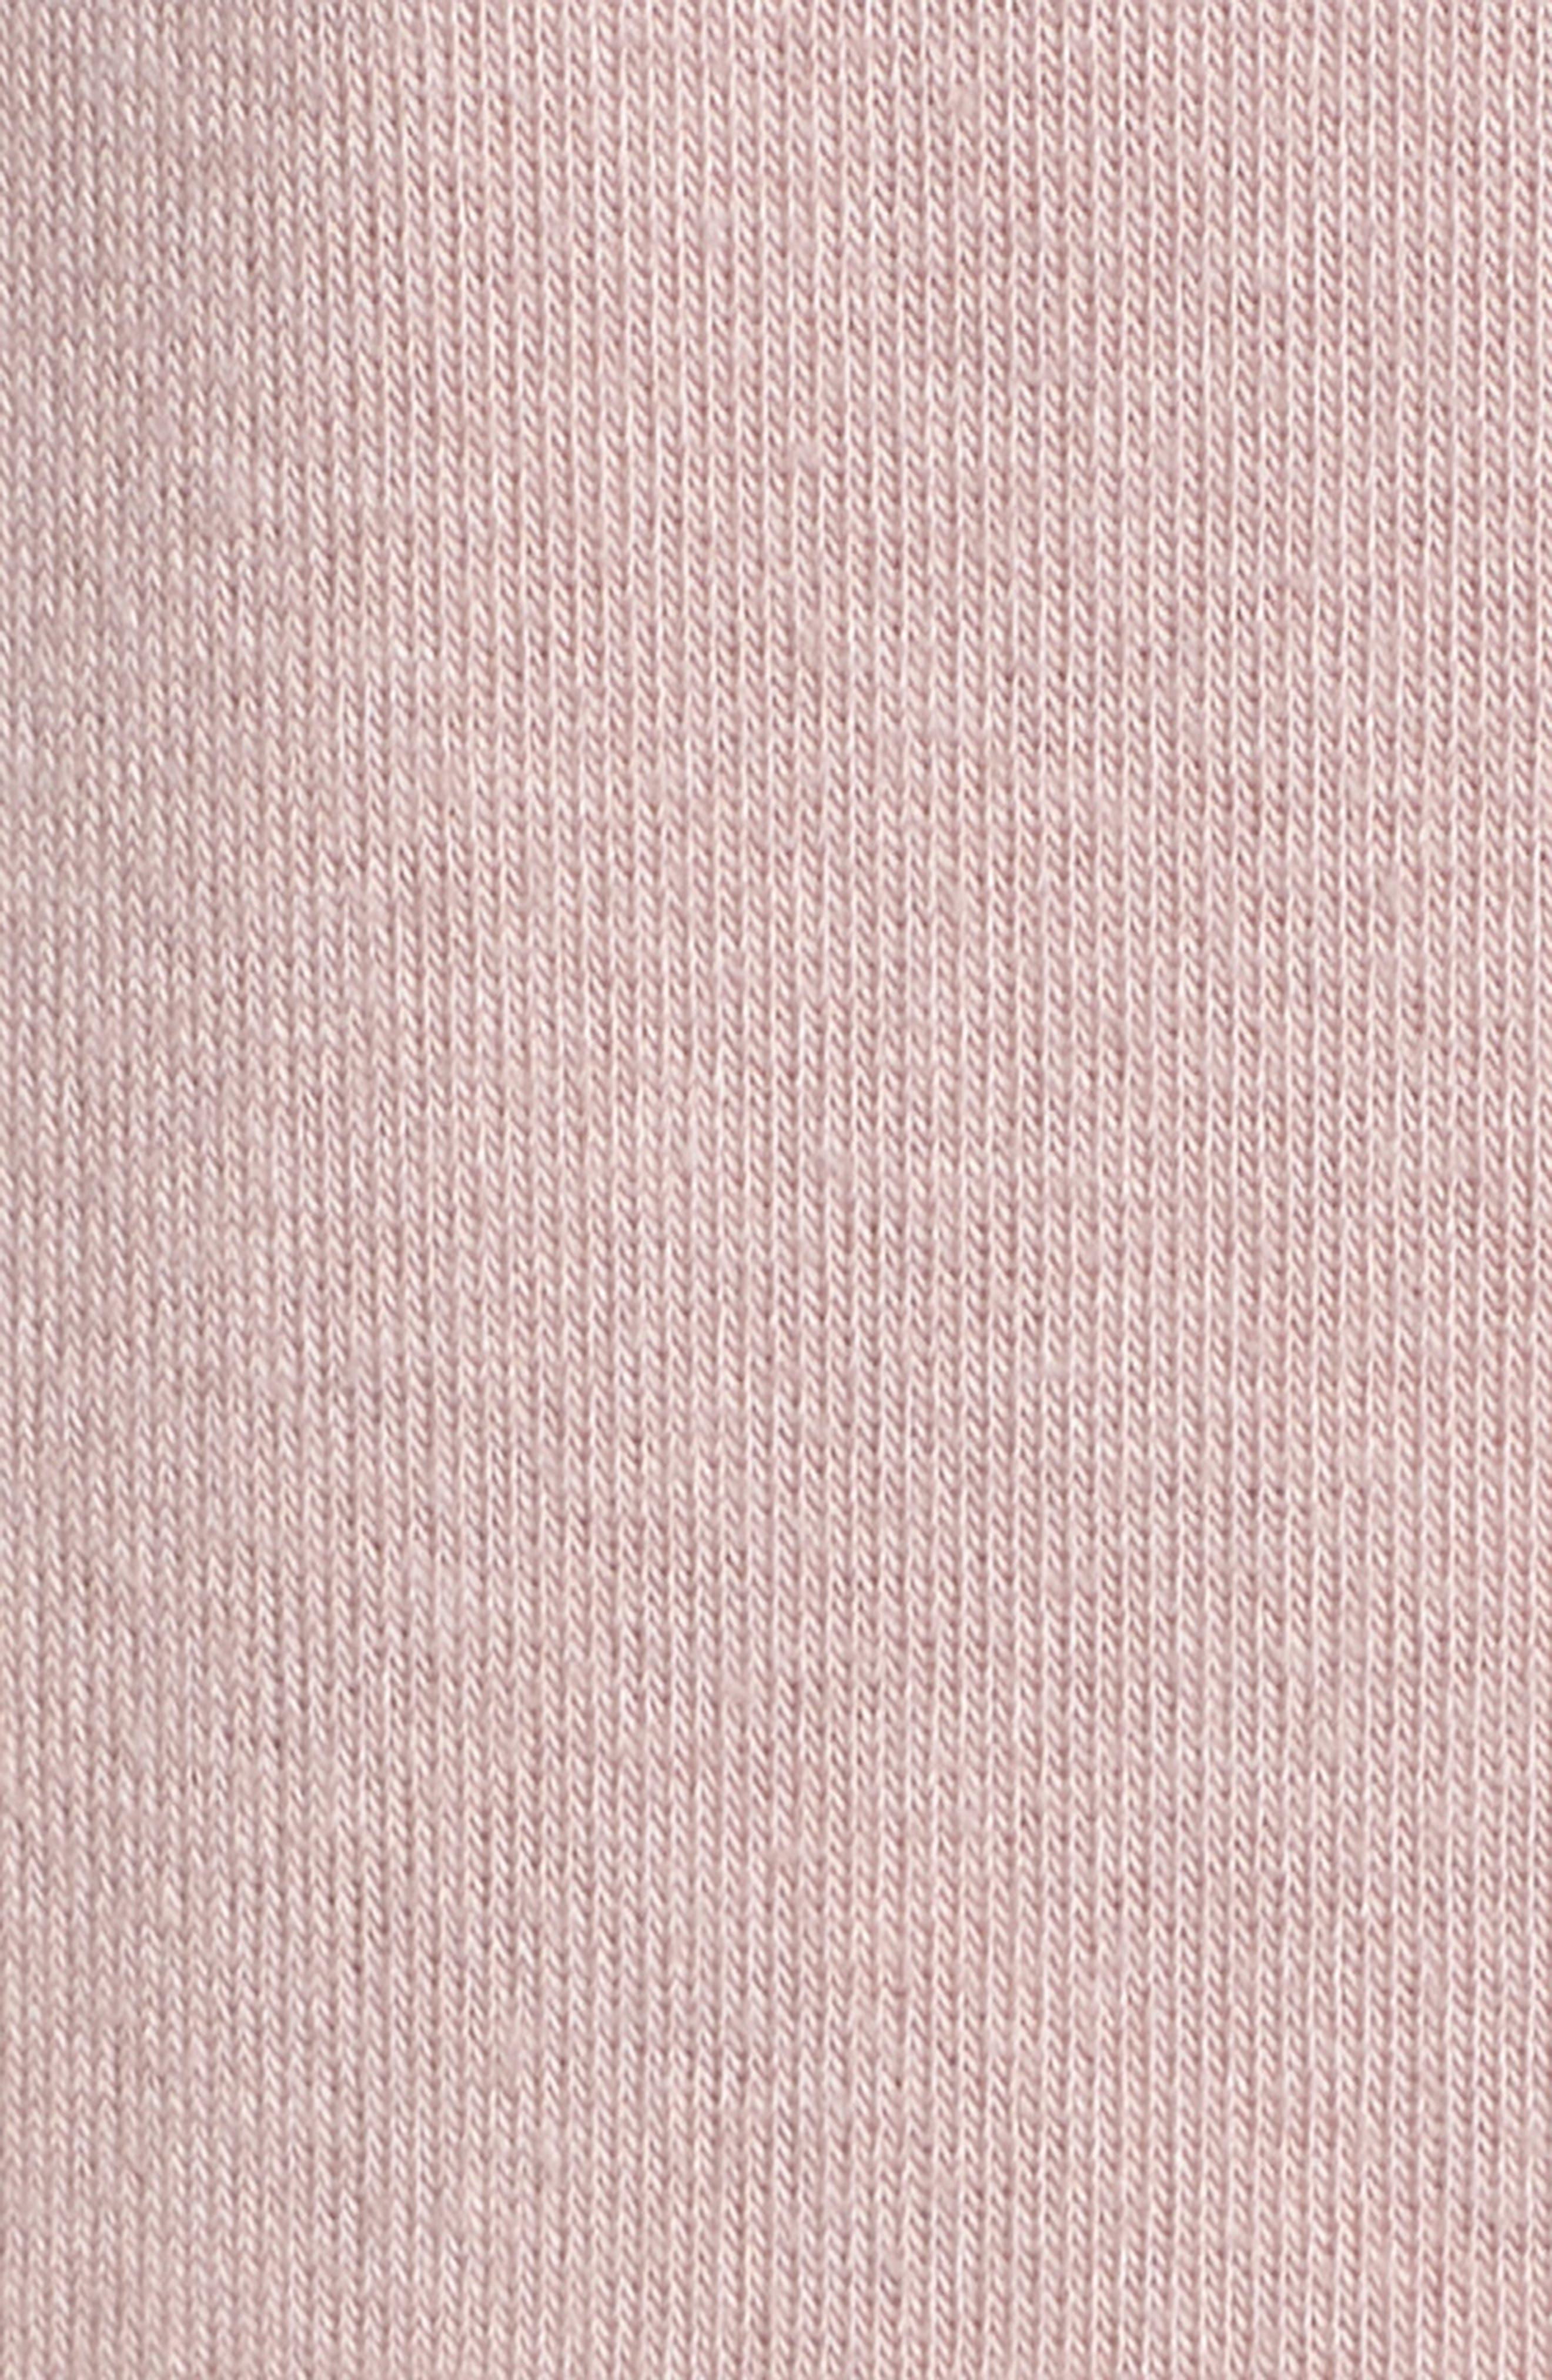 Retro Savasana Sweatshirt,                             Alternate thumbnail 6, color,                             650